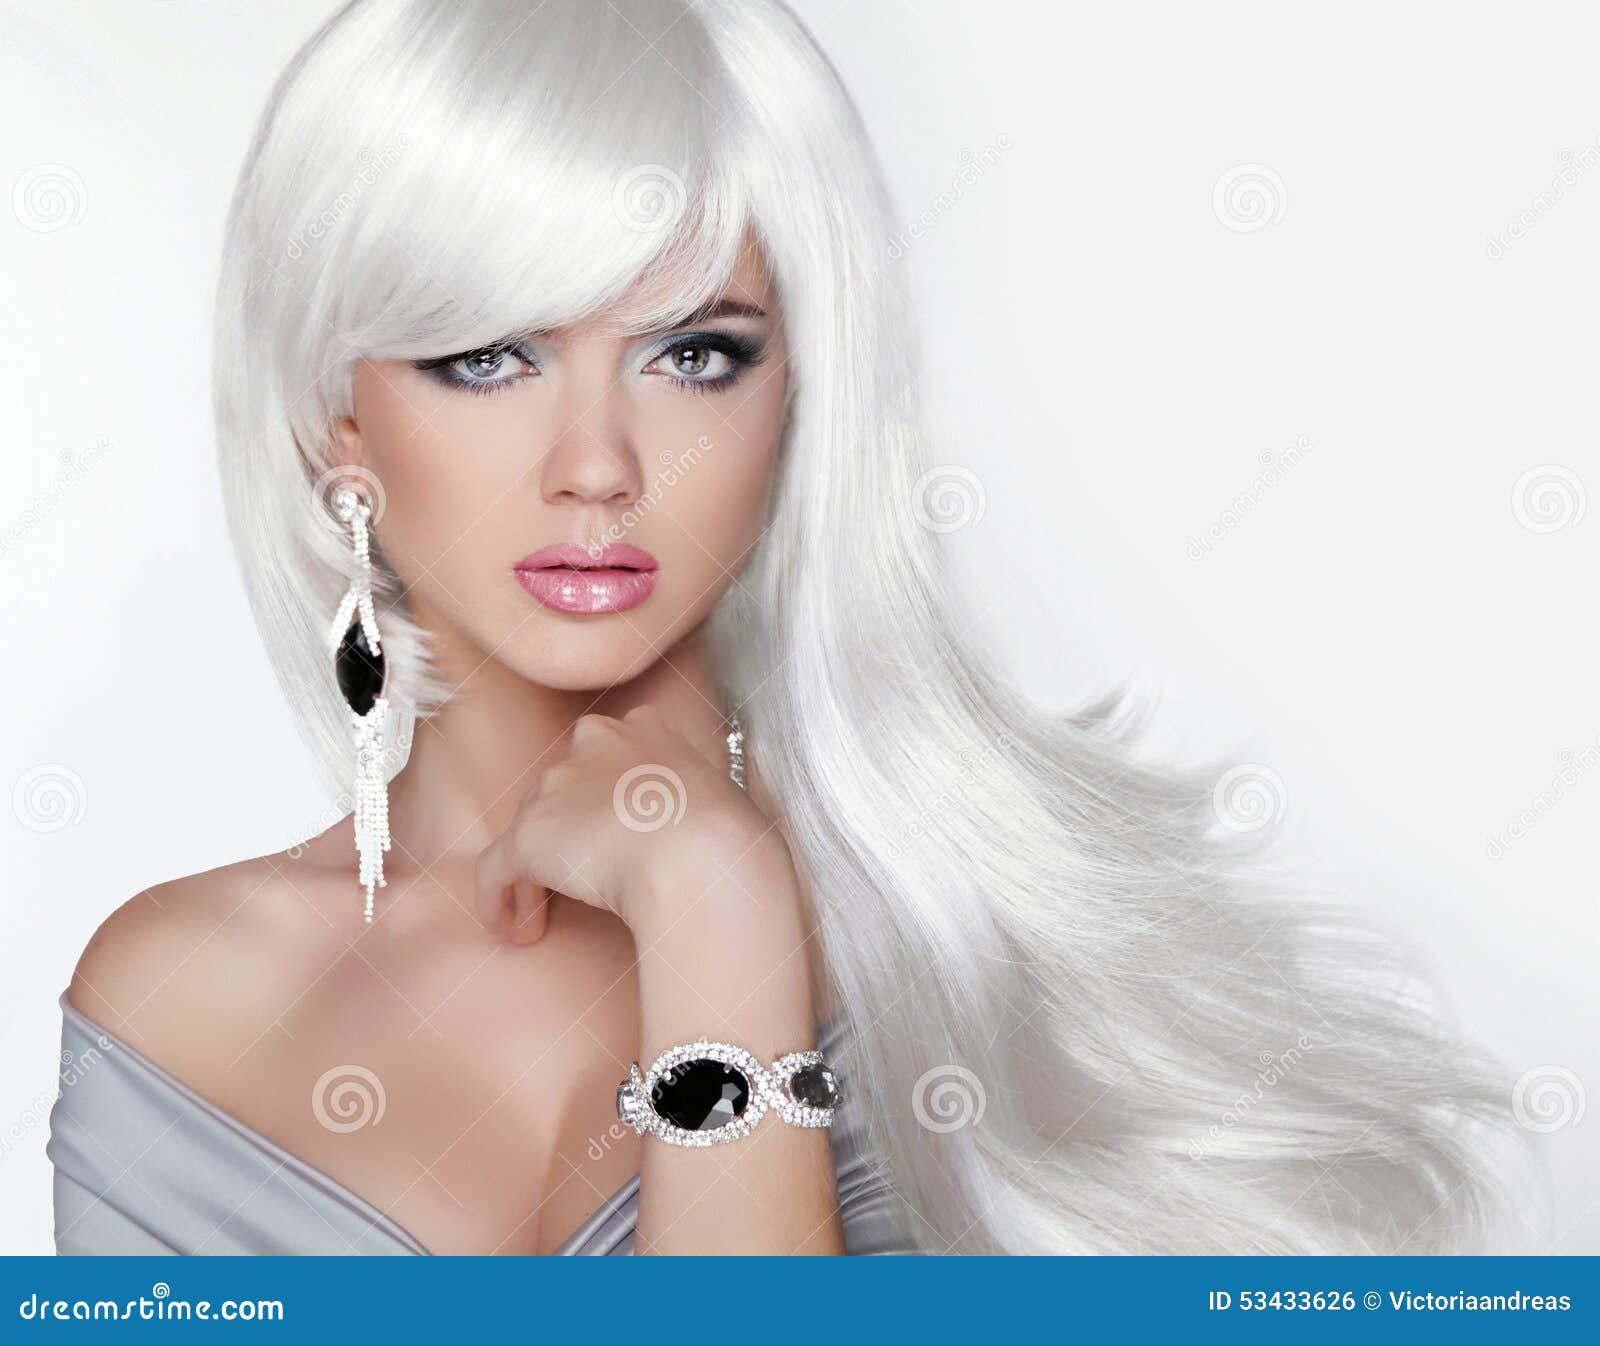 pelo largo muchacha rubia de la moda con el peinado ondulado blanco expensi foto de archivo